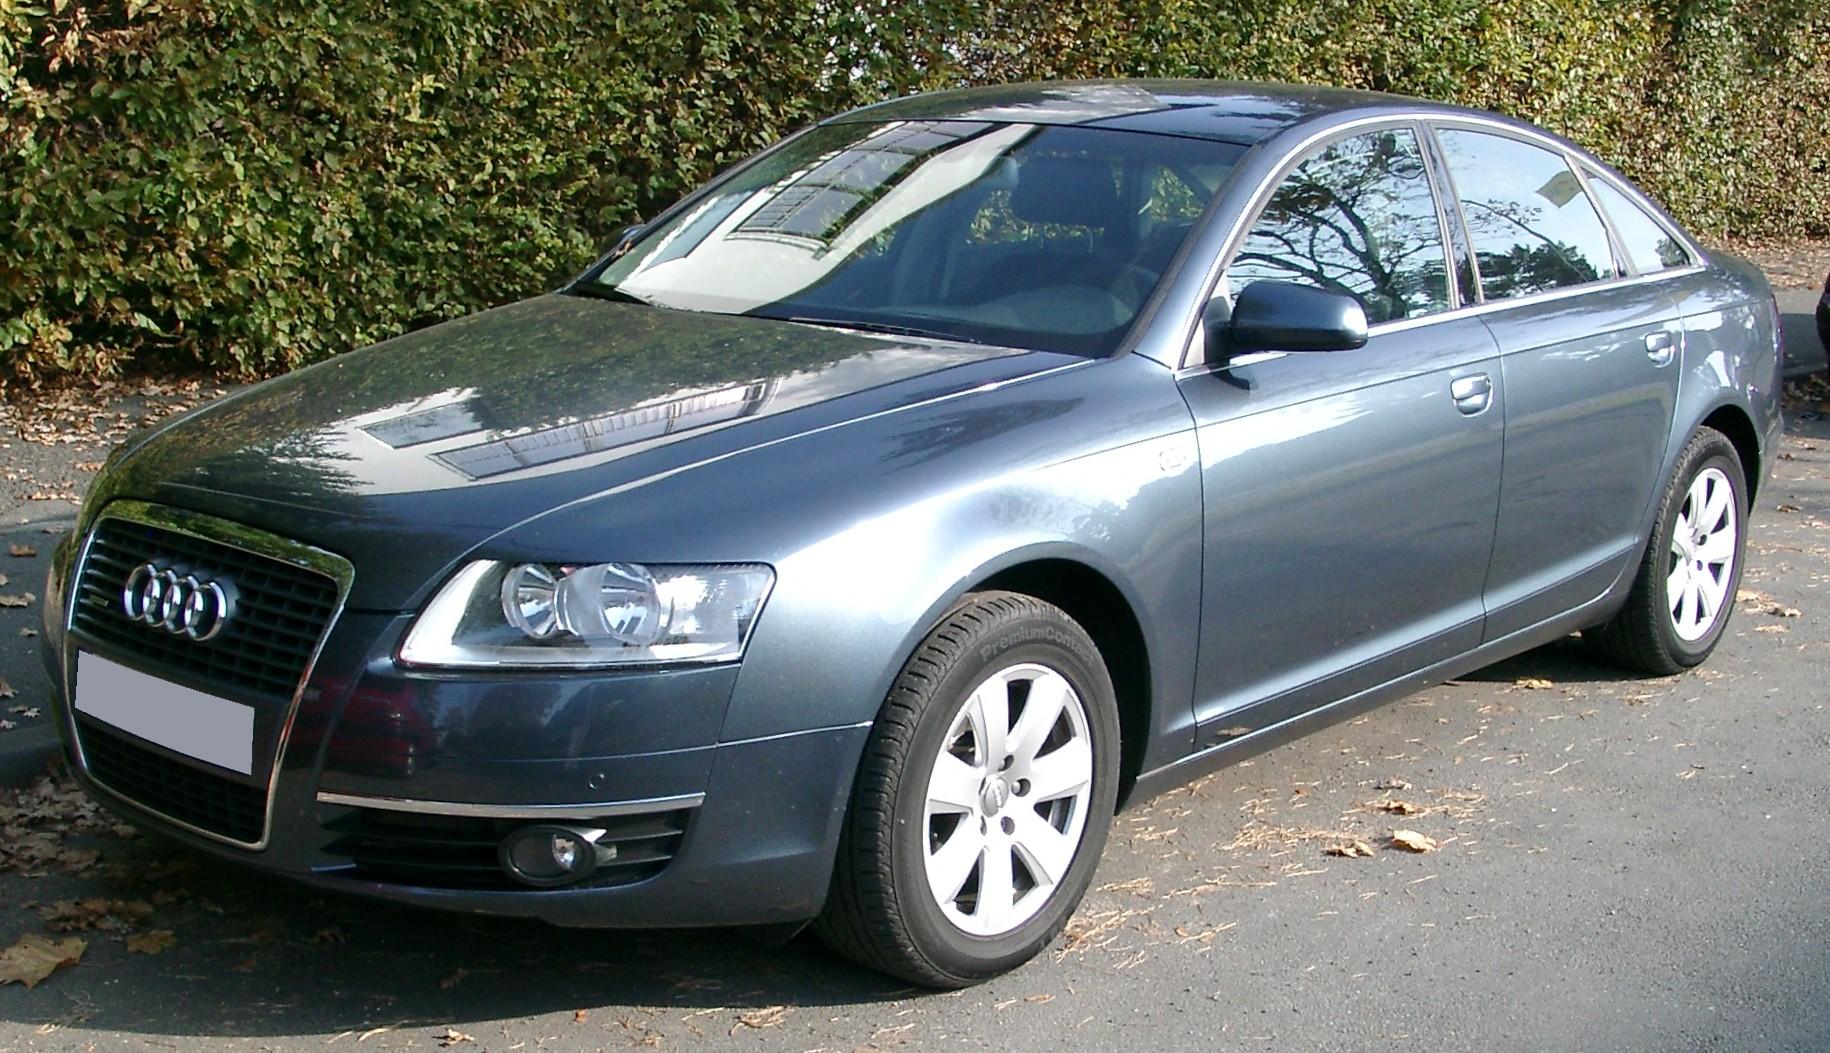 Archivo:Audi A6 front 20071011.jpg